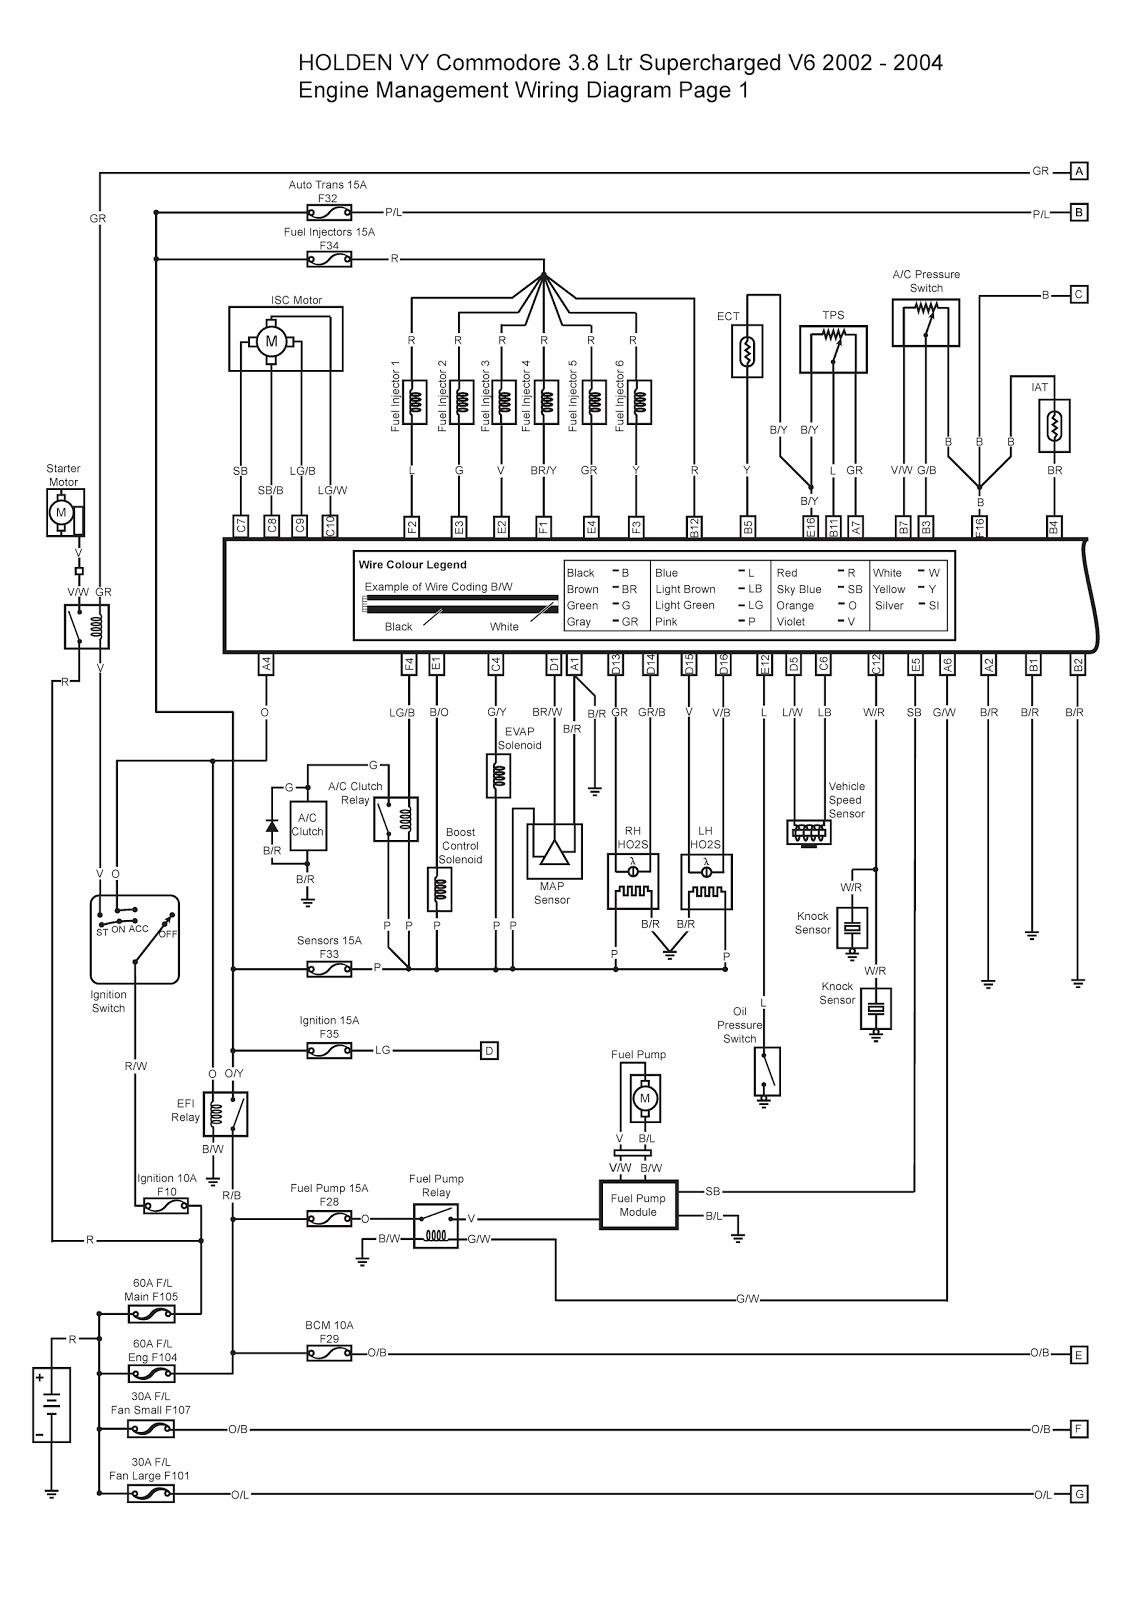 medium resolution of 2006 chevy cobalt ss supercharged engine chevrolet el camino holden ute hq holden wiring diagram holden